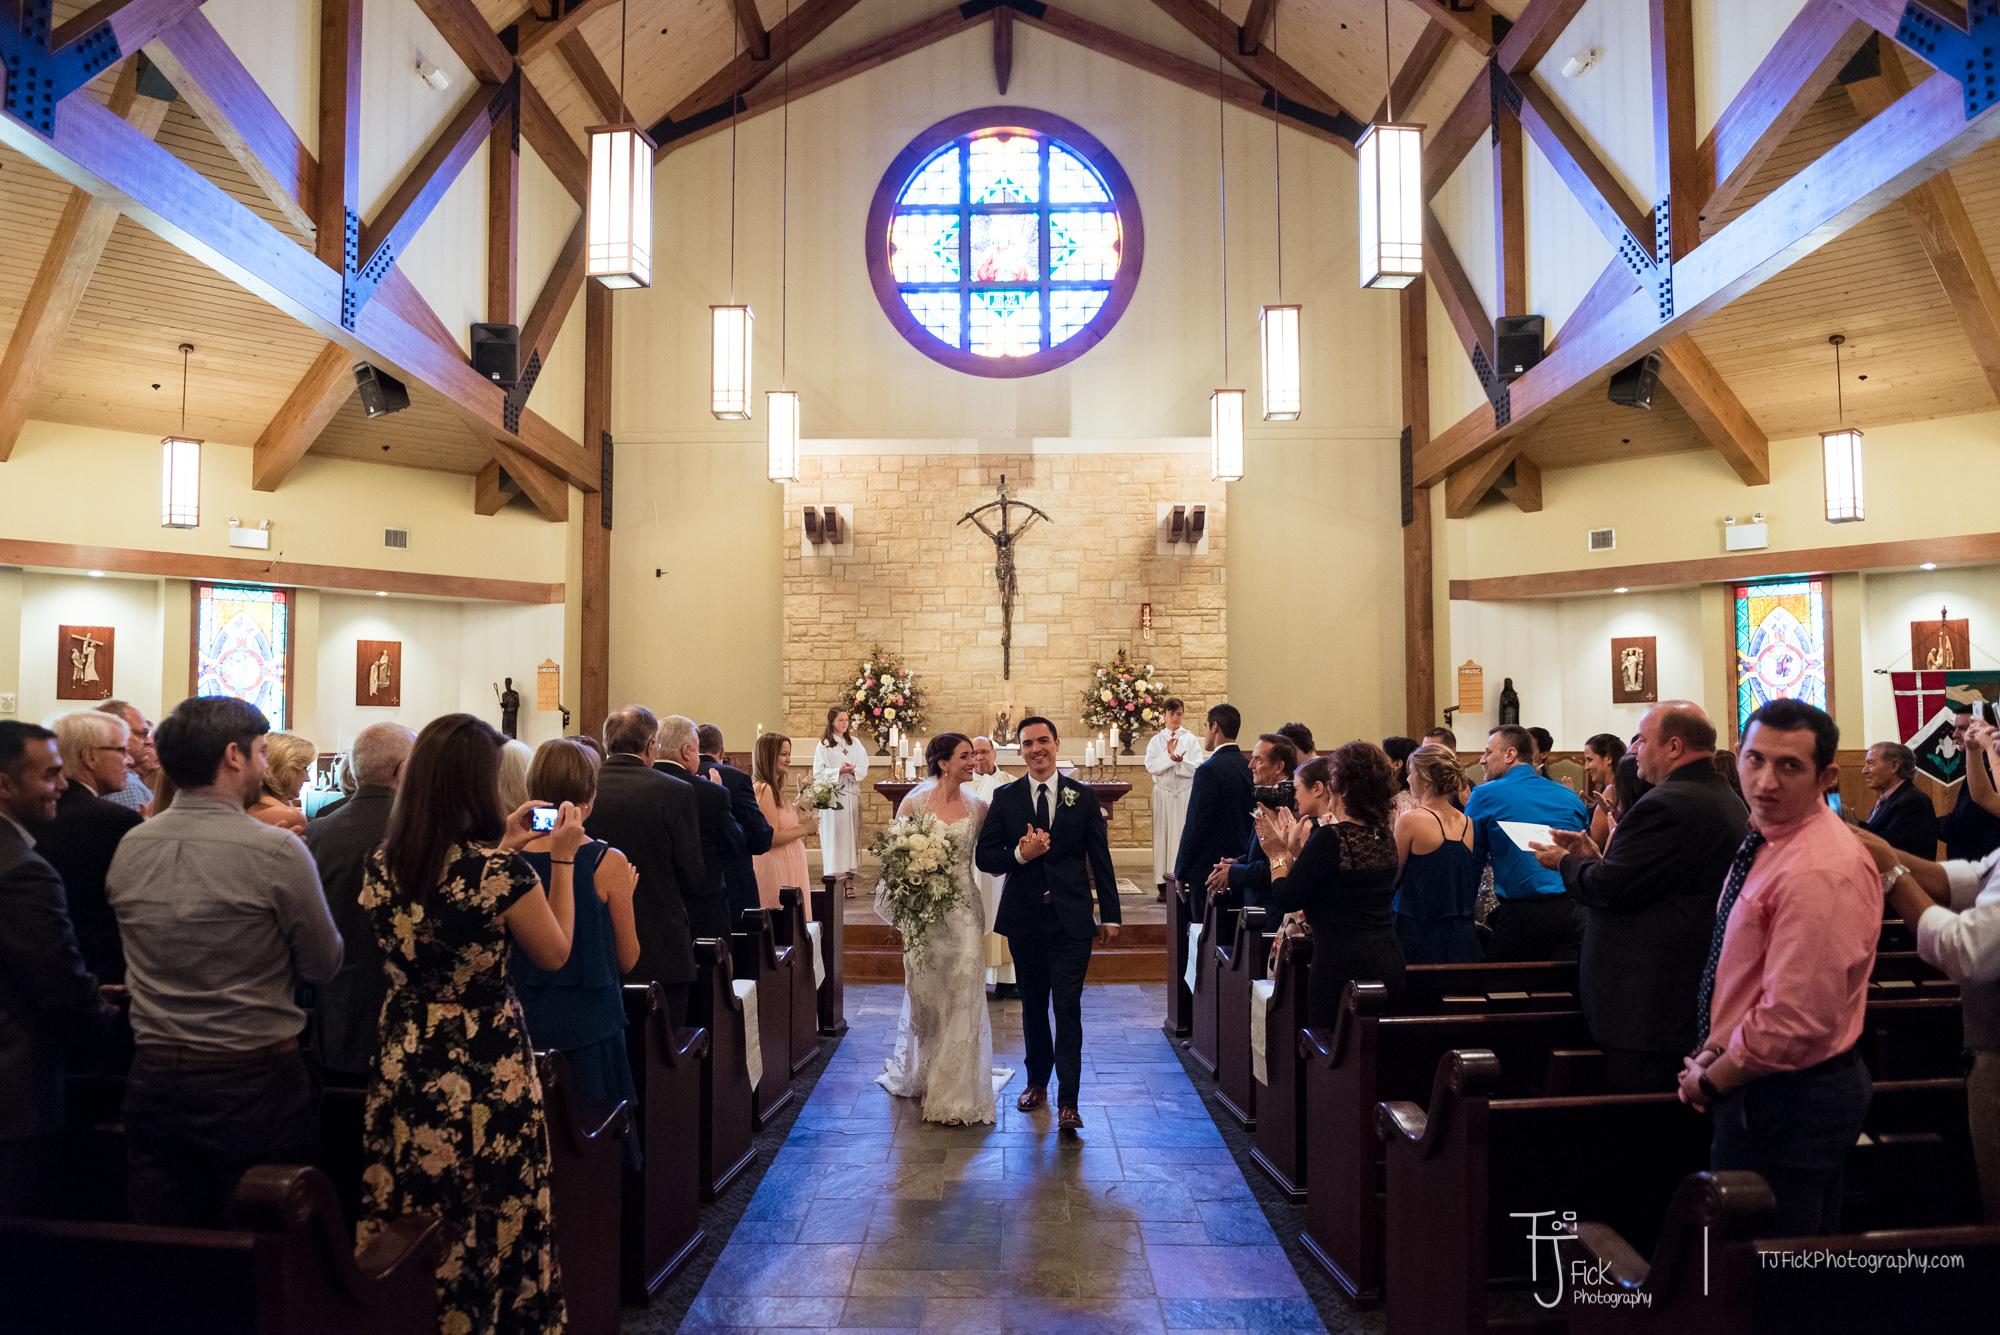 ©TJ Fick Photography www.tjfickphotography.com